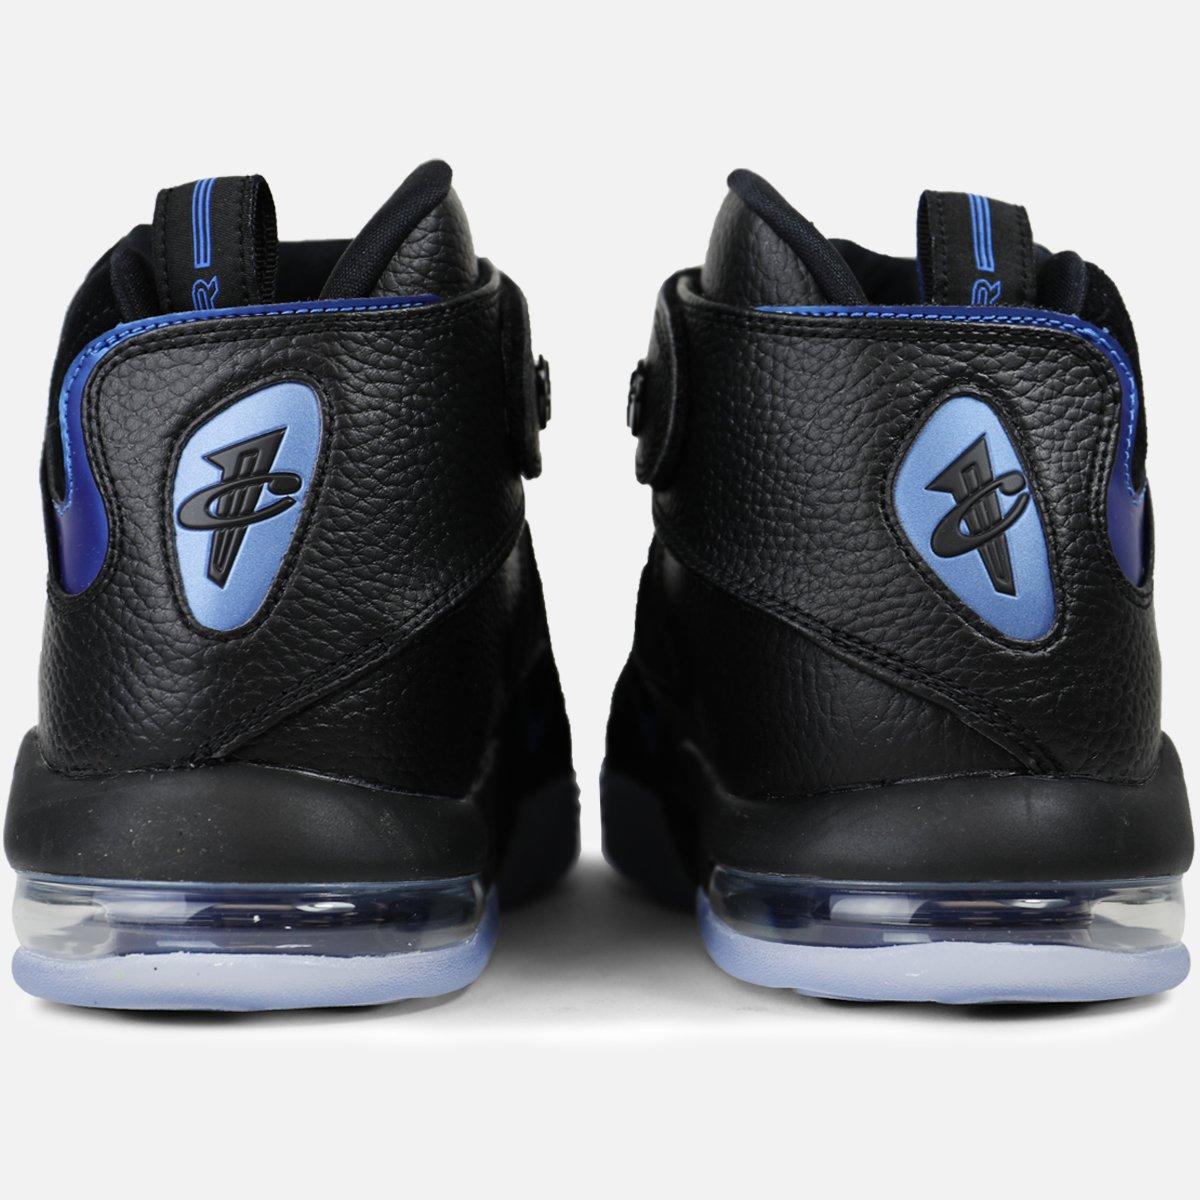 Nike Air Penny IV Black-Dark Neon Royal 3